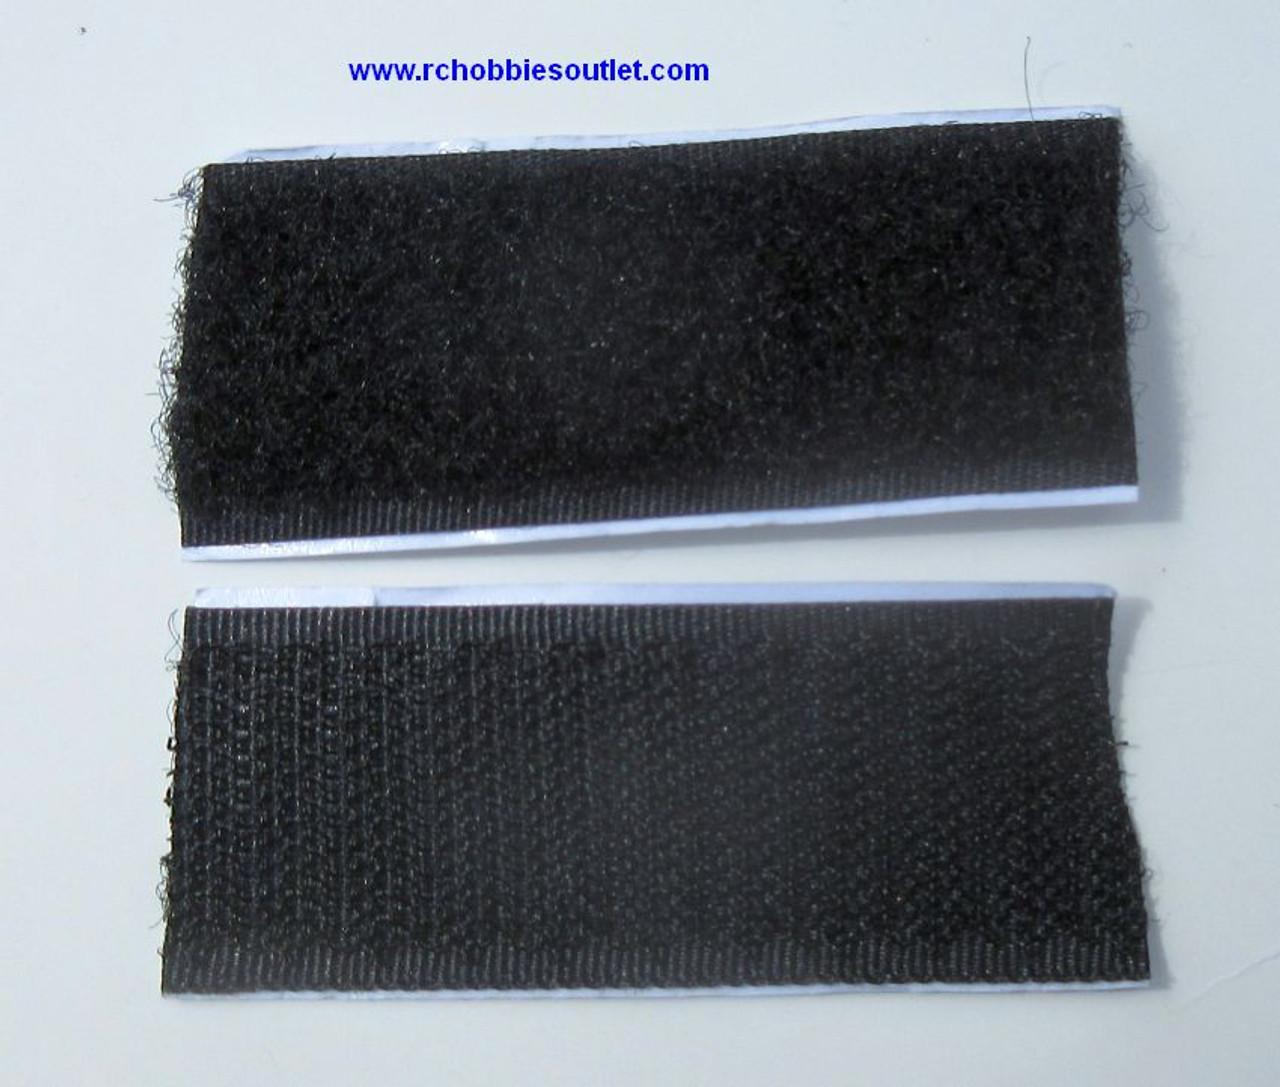 Velcro strip for attaching Batteries etc. ( 2 Pieces)